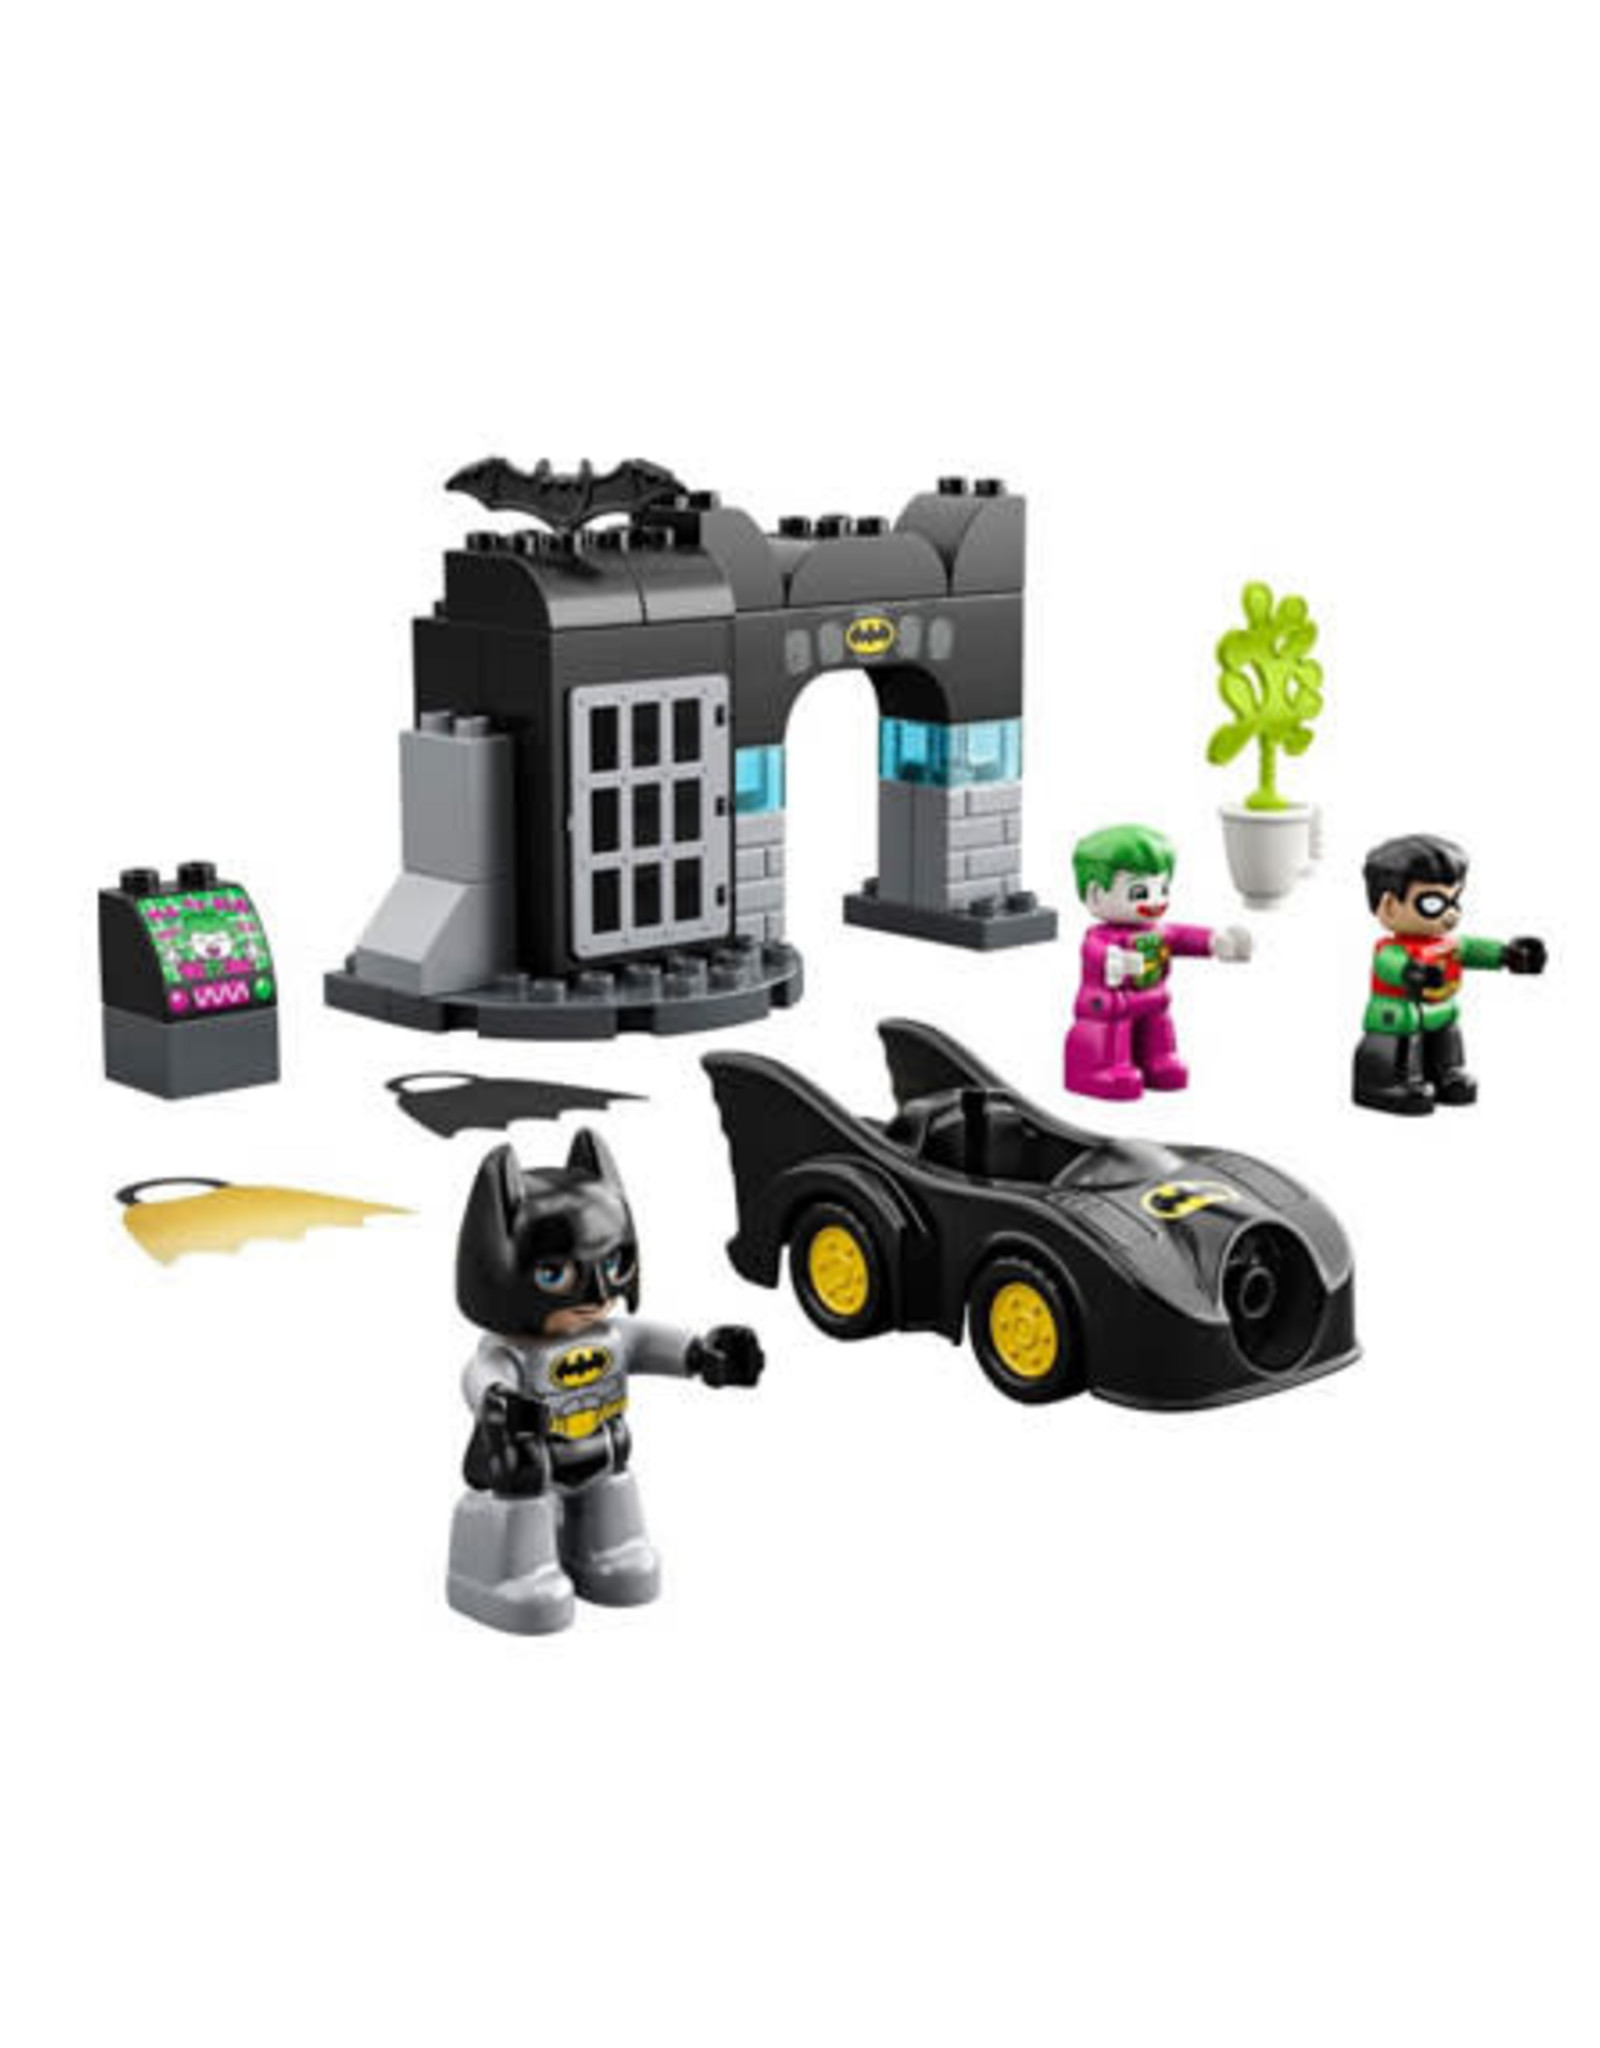 LEGO LEGO 10919 Batcave DUPLO NIEUW